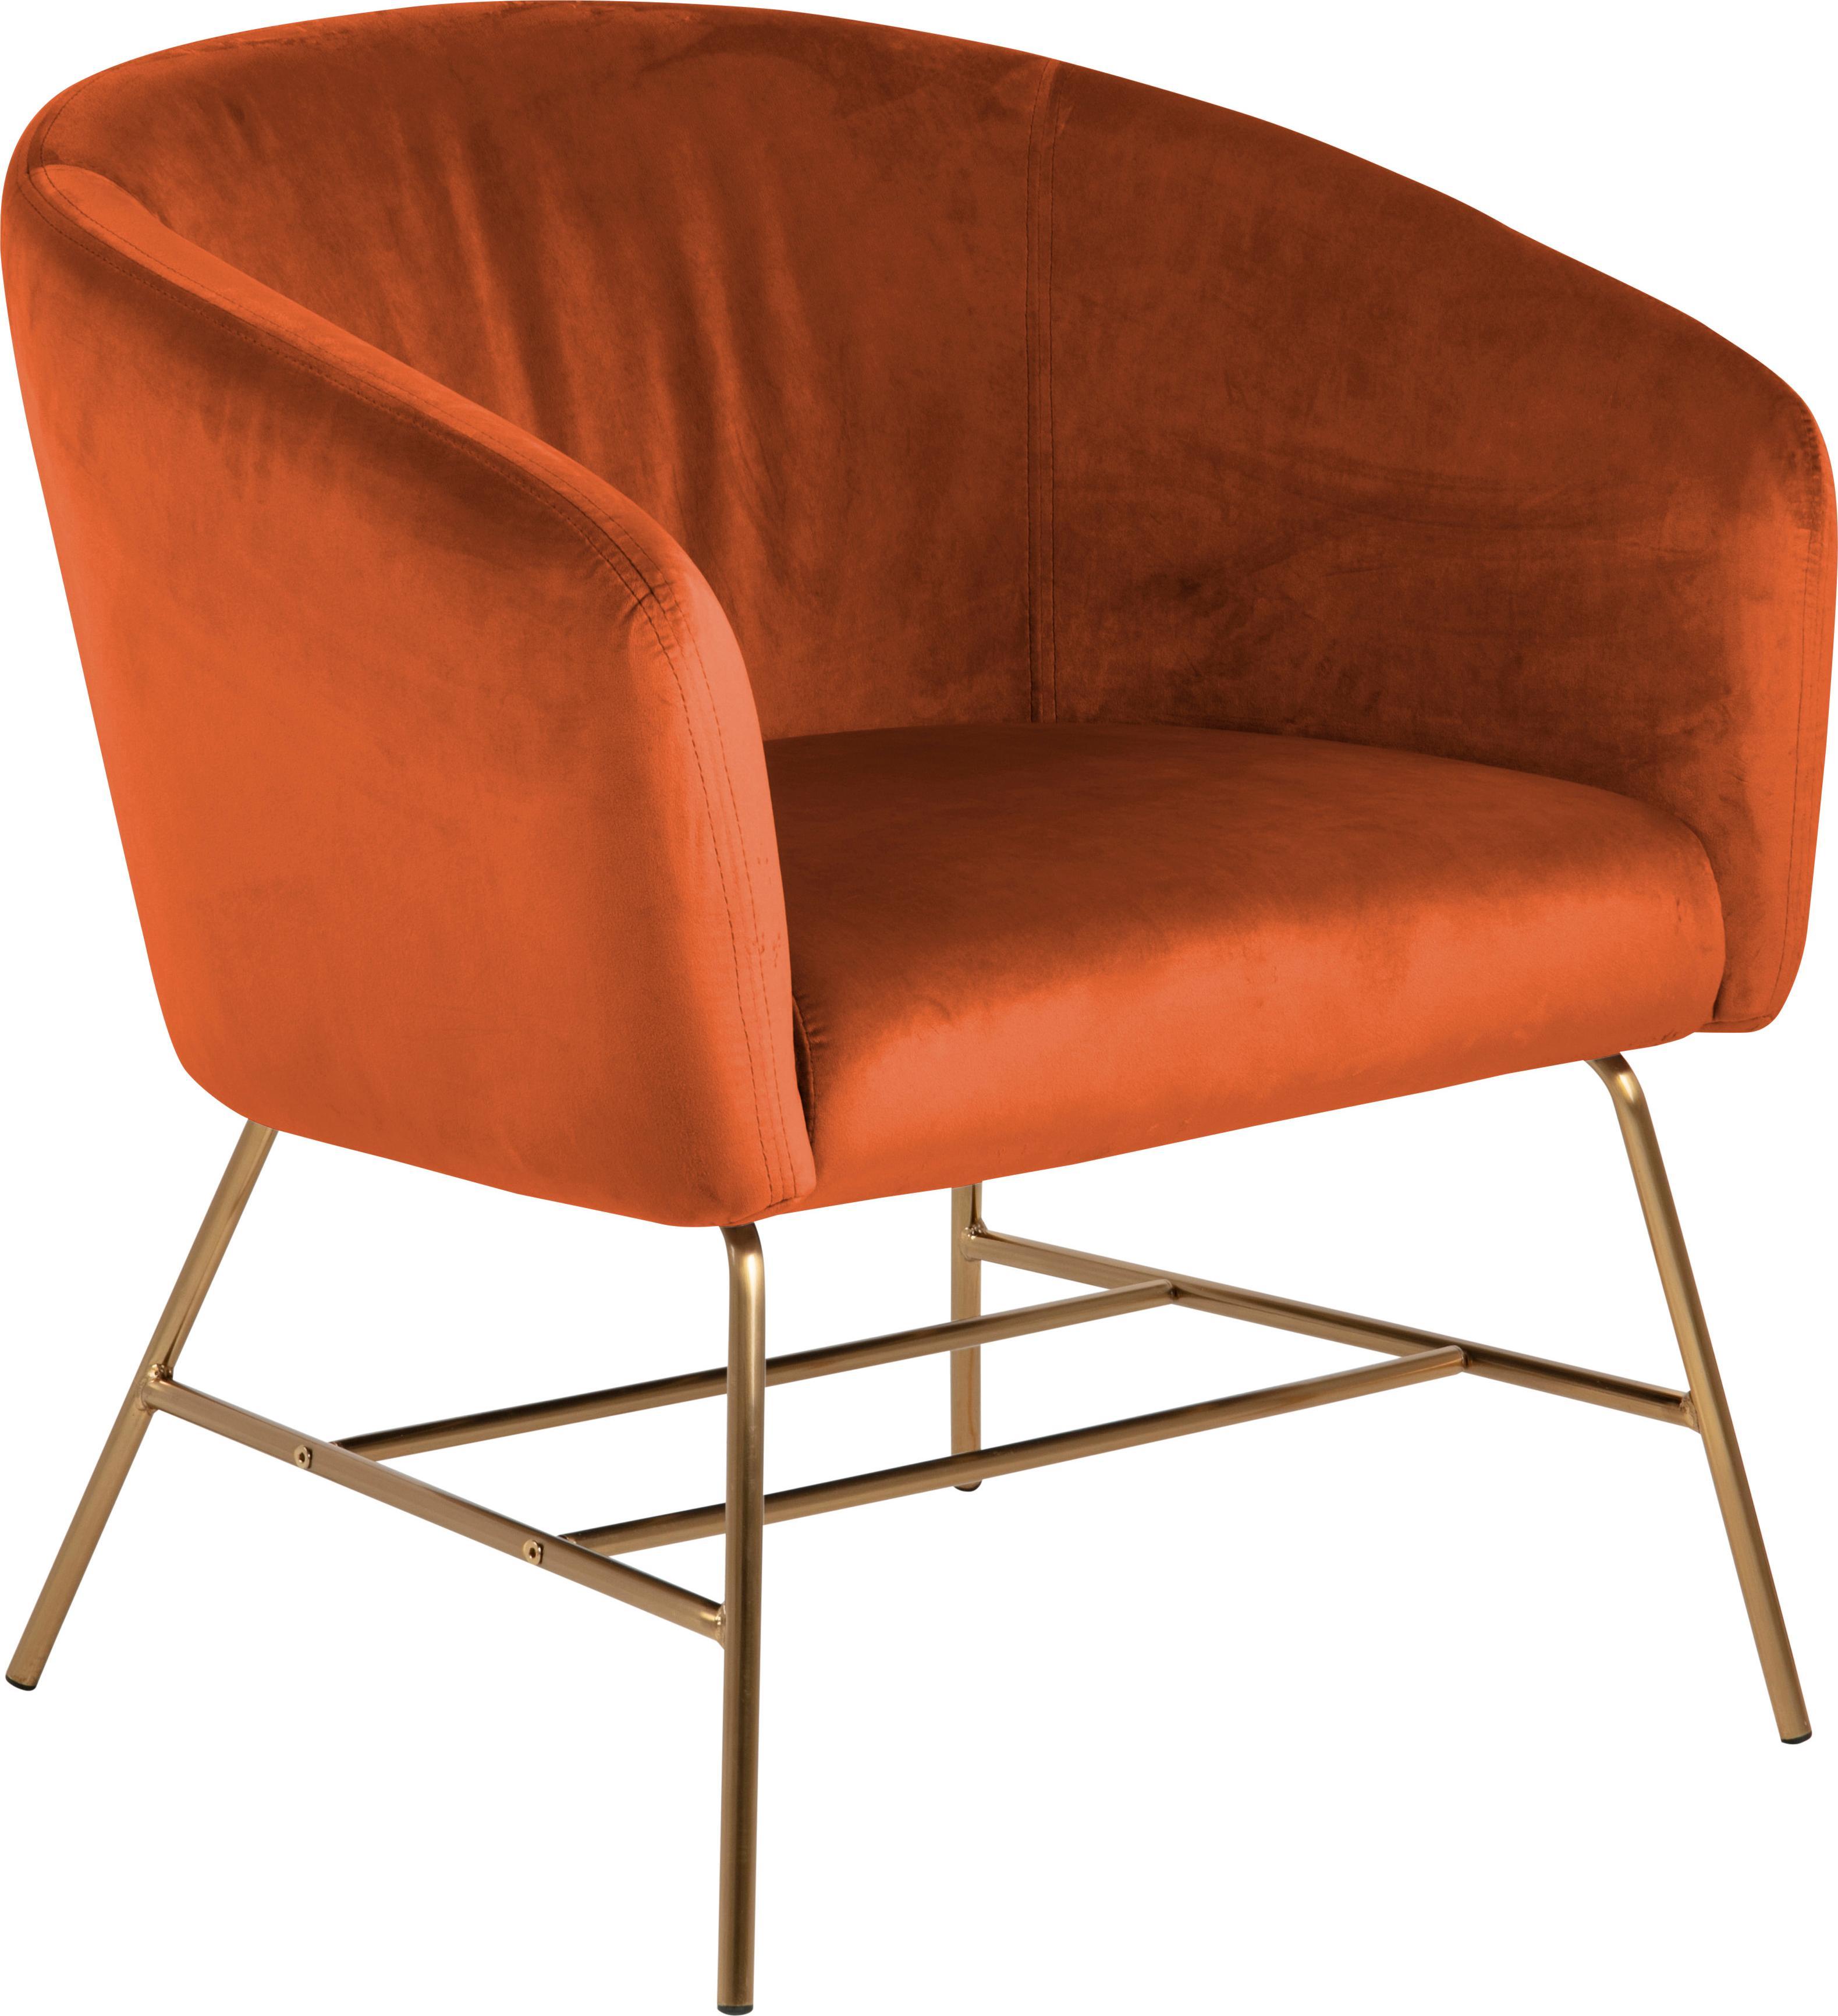 Moderne fluwelen fauteuil Ramsey in koperkleurig, Bekleding: polyester fluweel, Poten: gelakt metaal, Fluweel koperkleurig, B 72 x D 67 cm